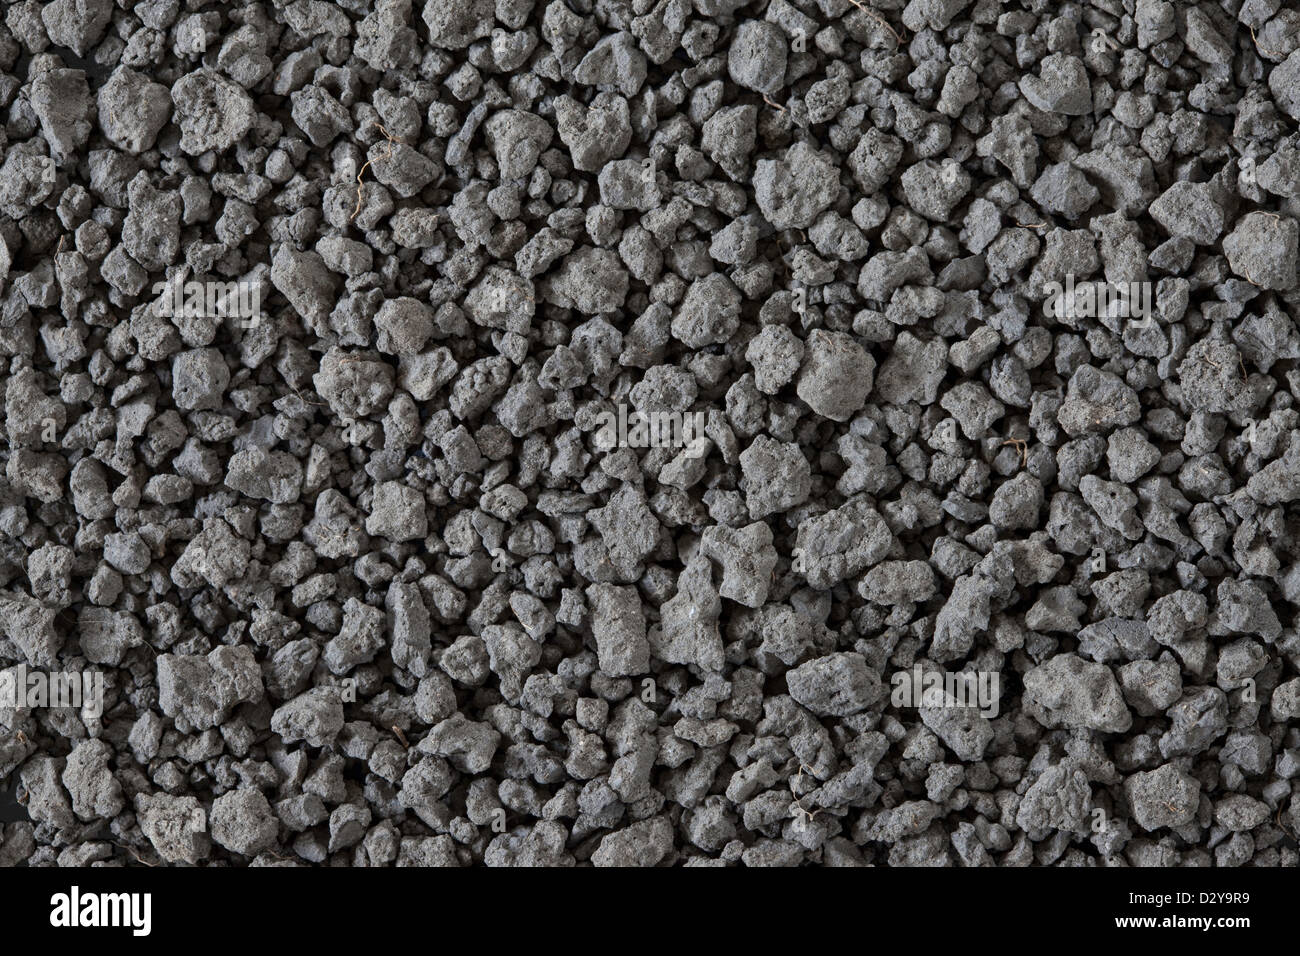 Clay Loam Soil Sample, (Sand 26, Silt 44, Clay 30) - Stock Image